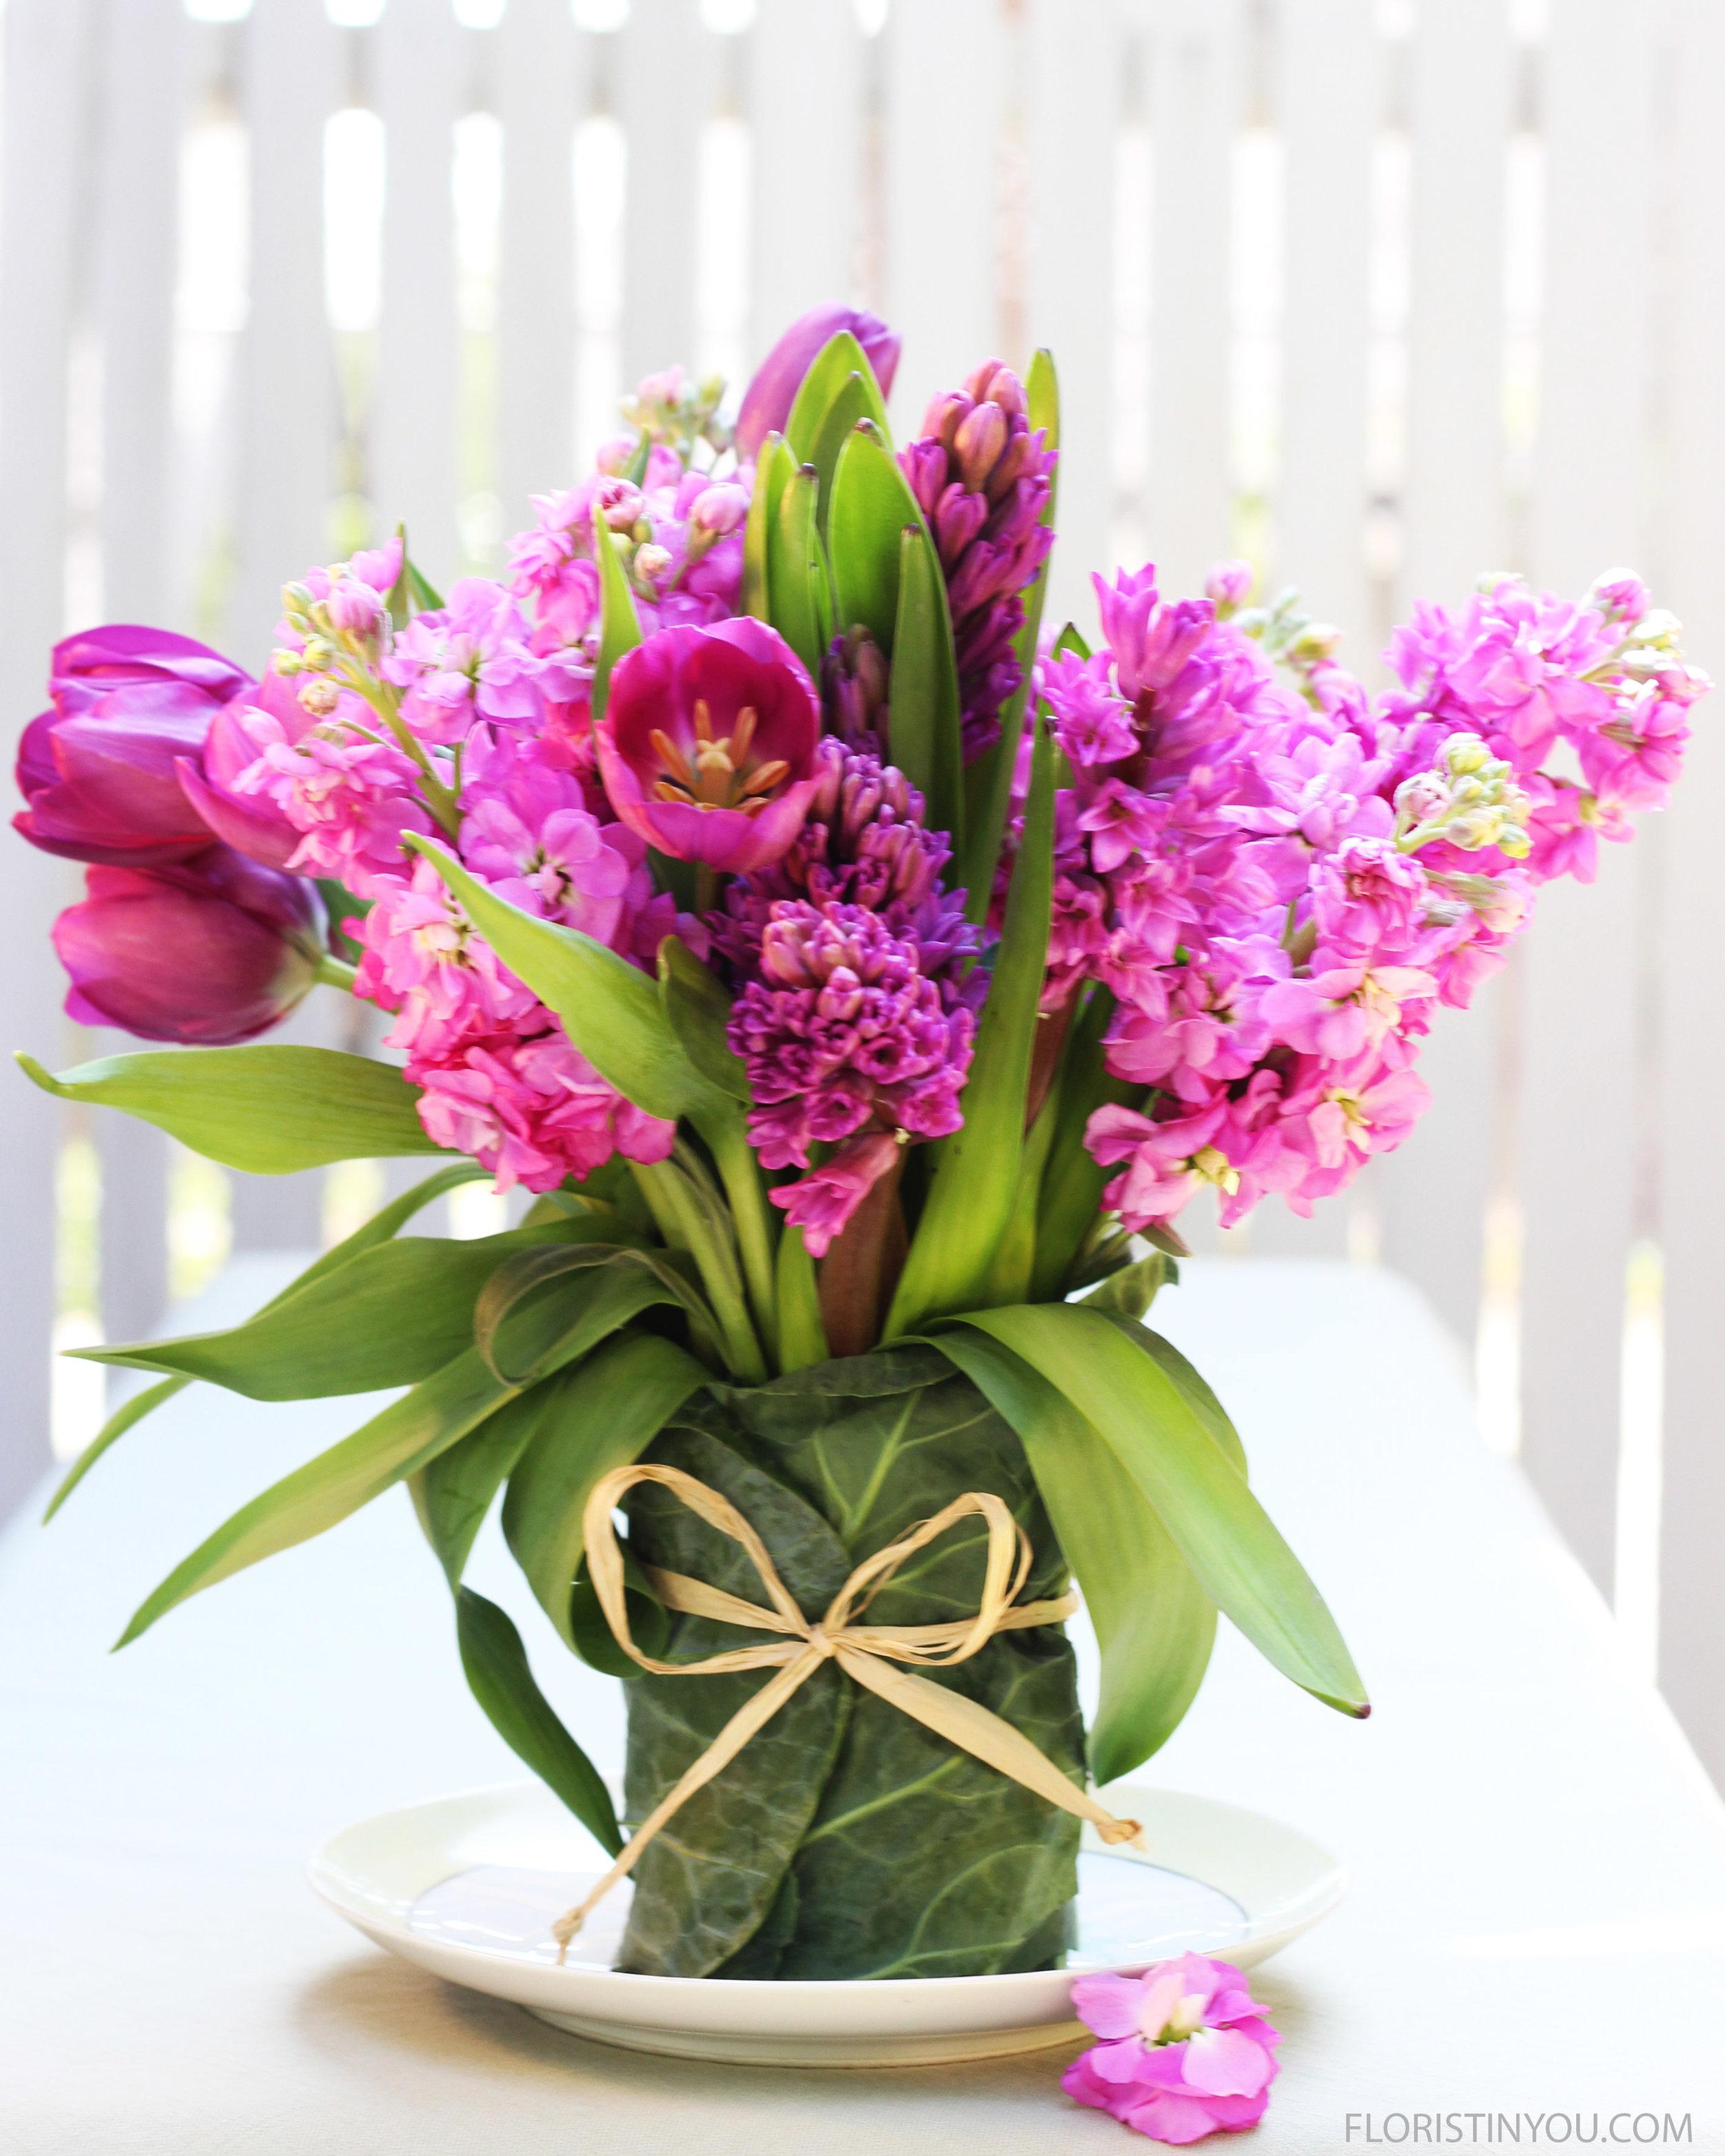 Hyacinth Tulips & Stock